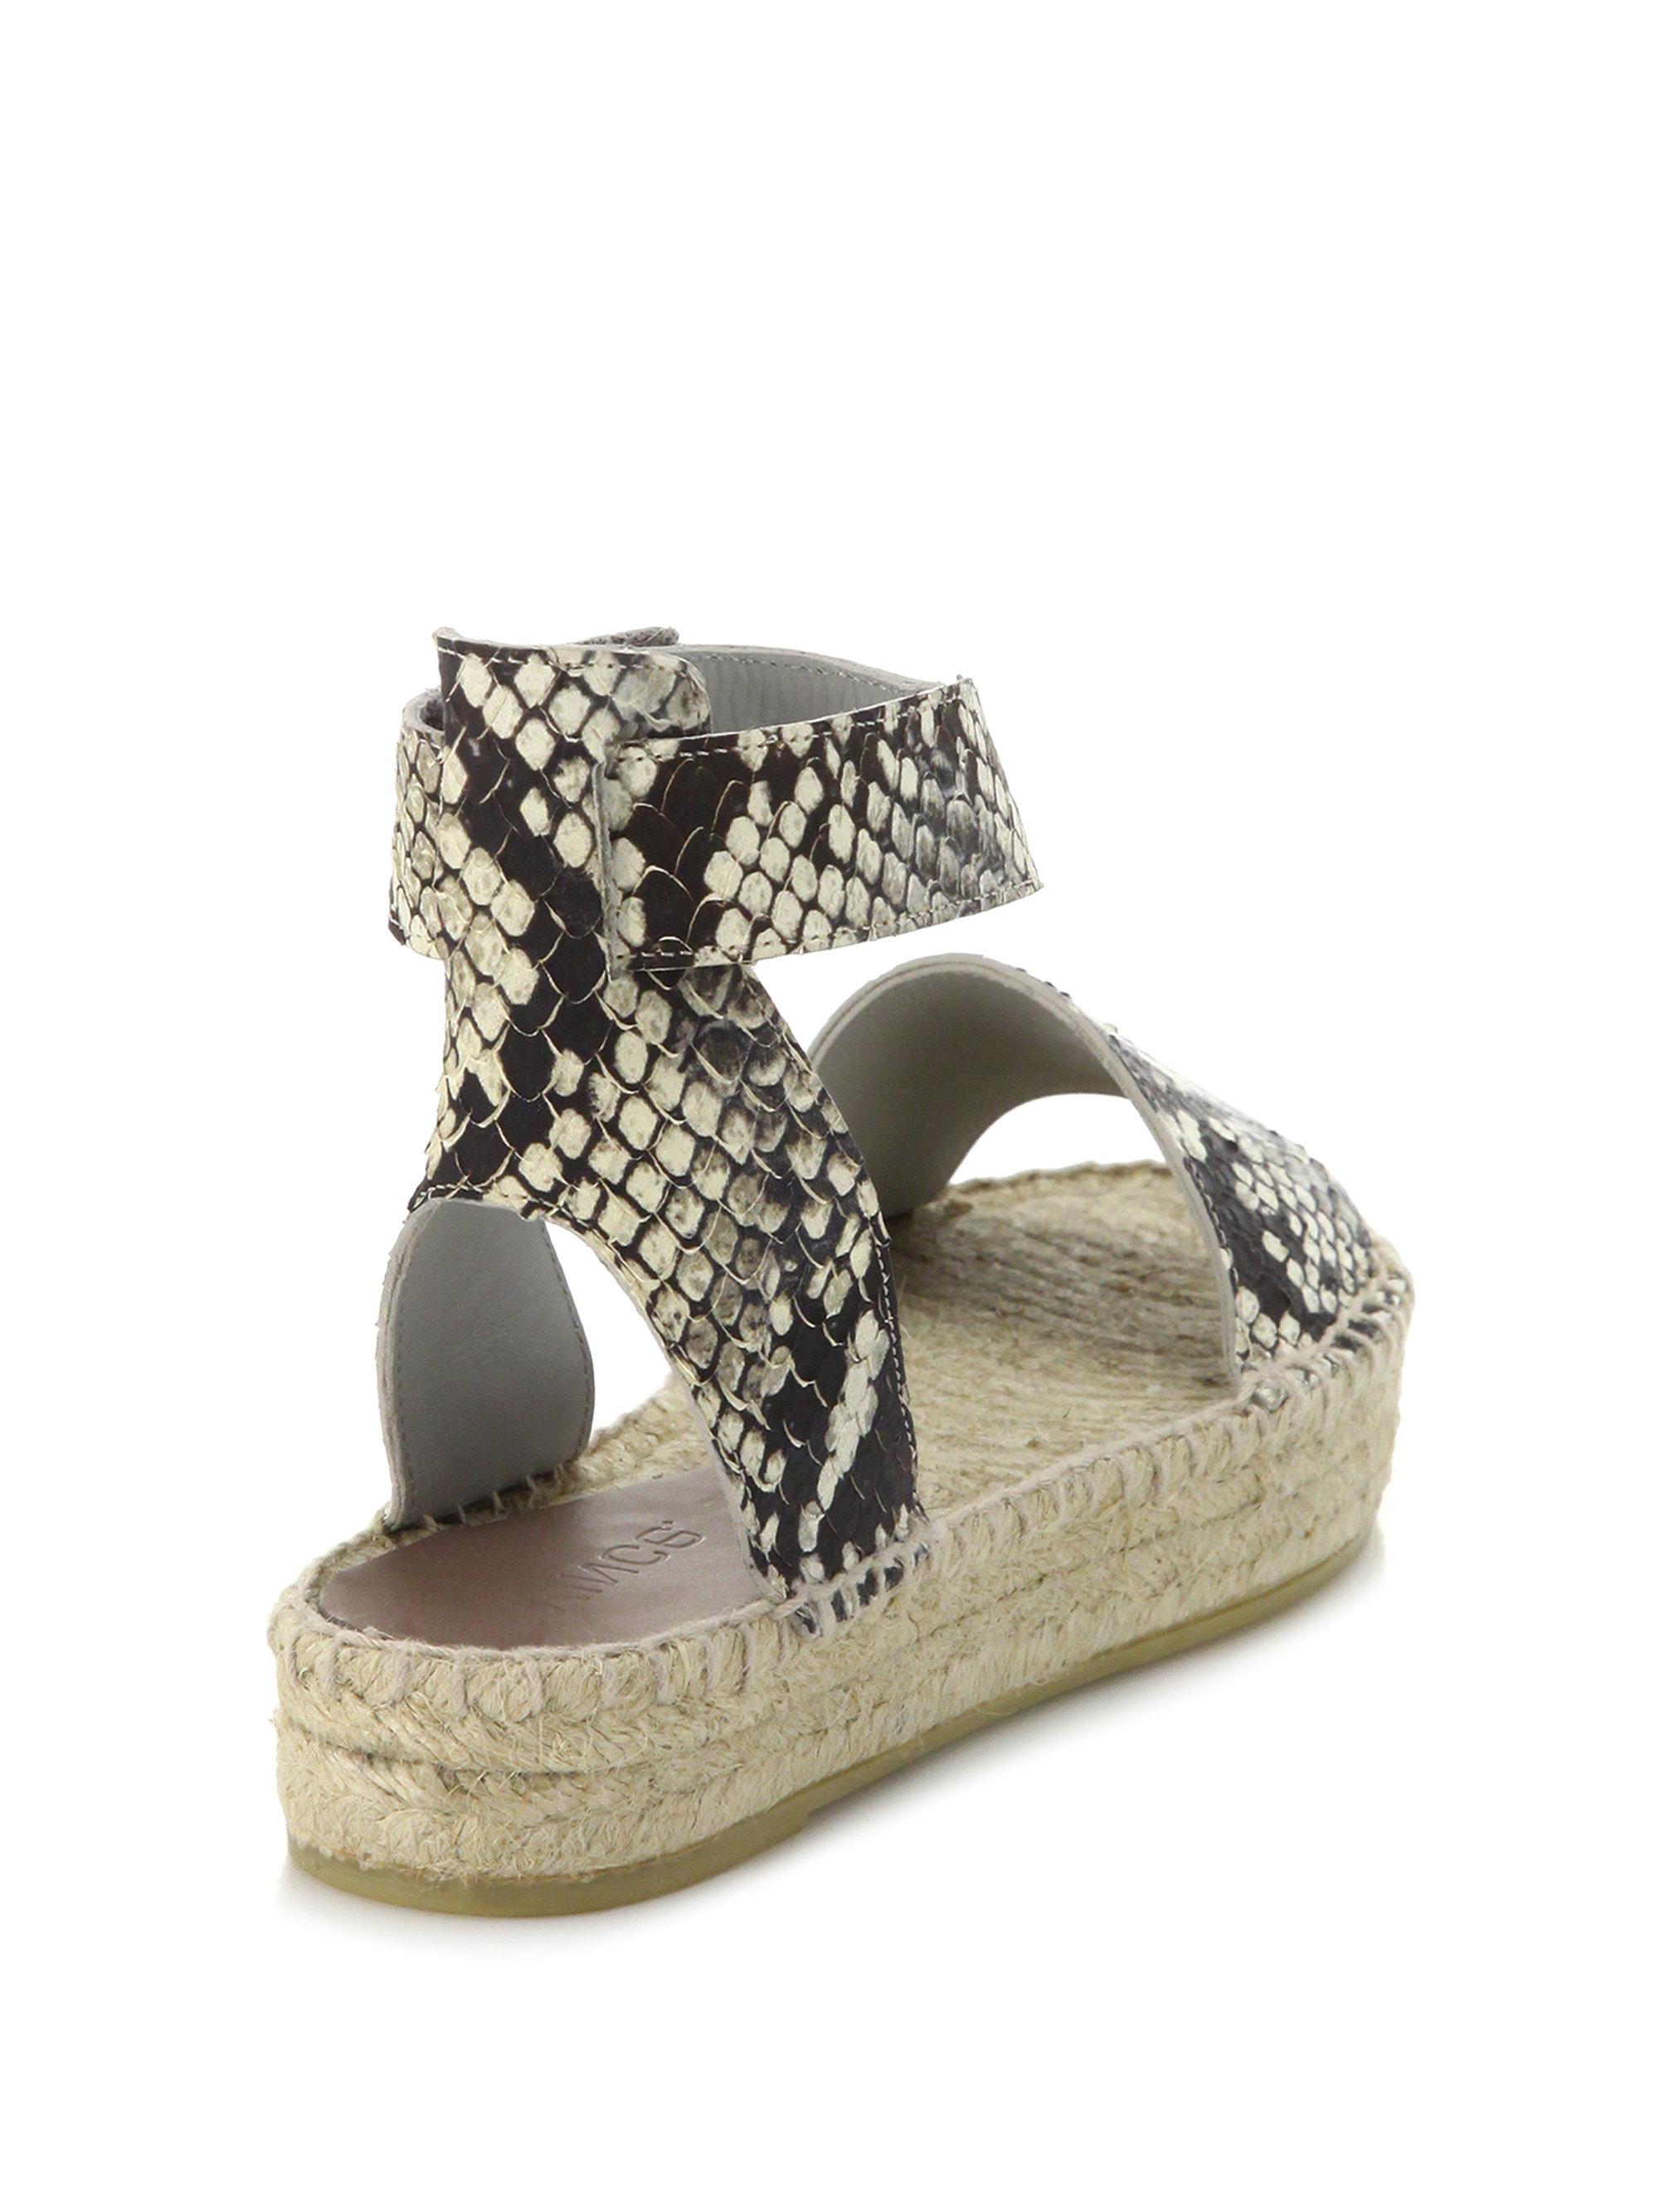 Vince Edie Snake Embossed Leather Espadrille Sandals In